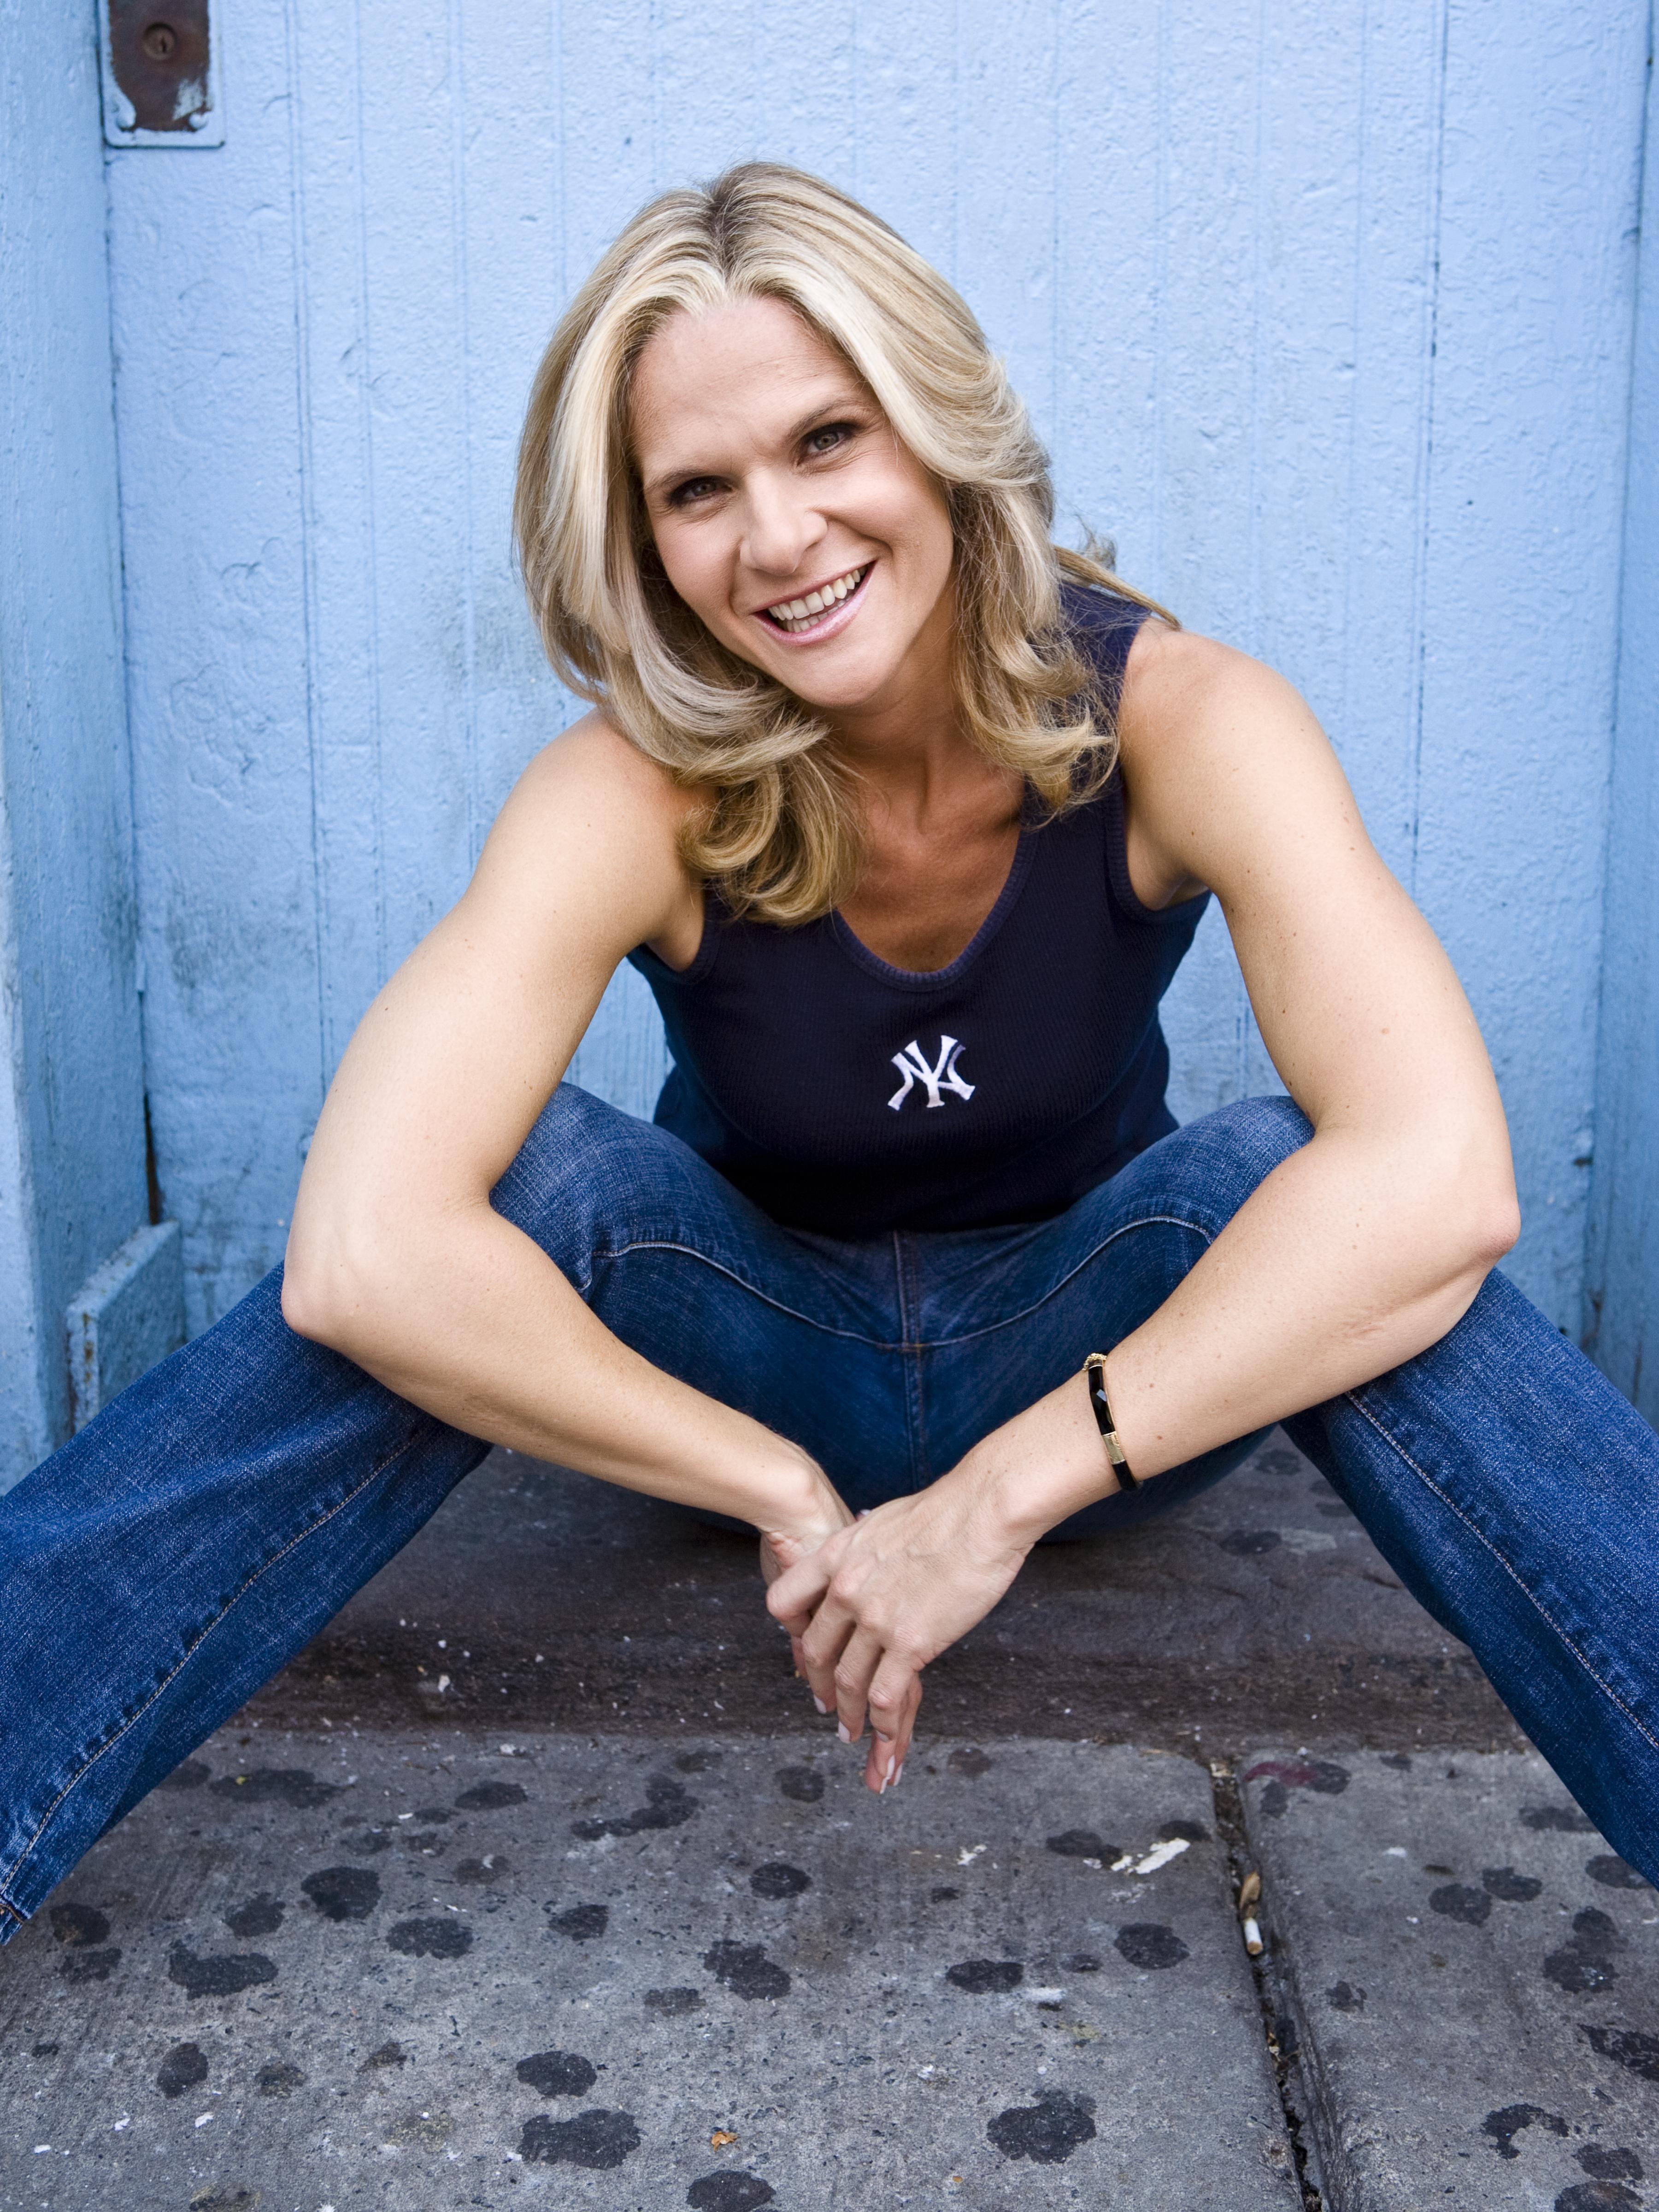 laura harris fitness - photo #28